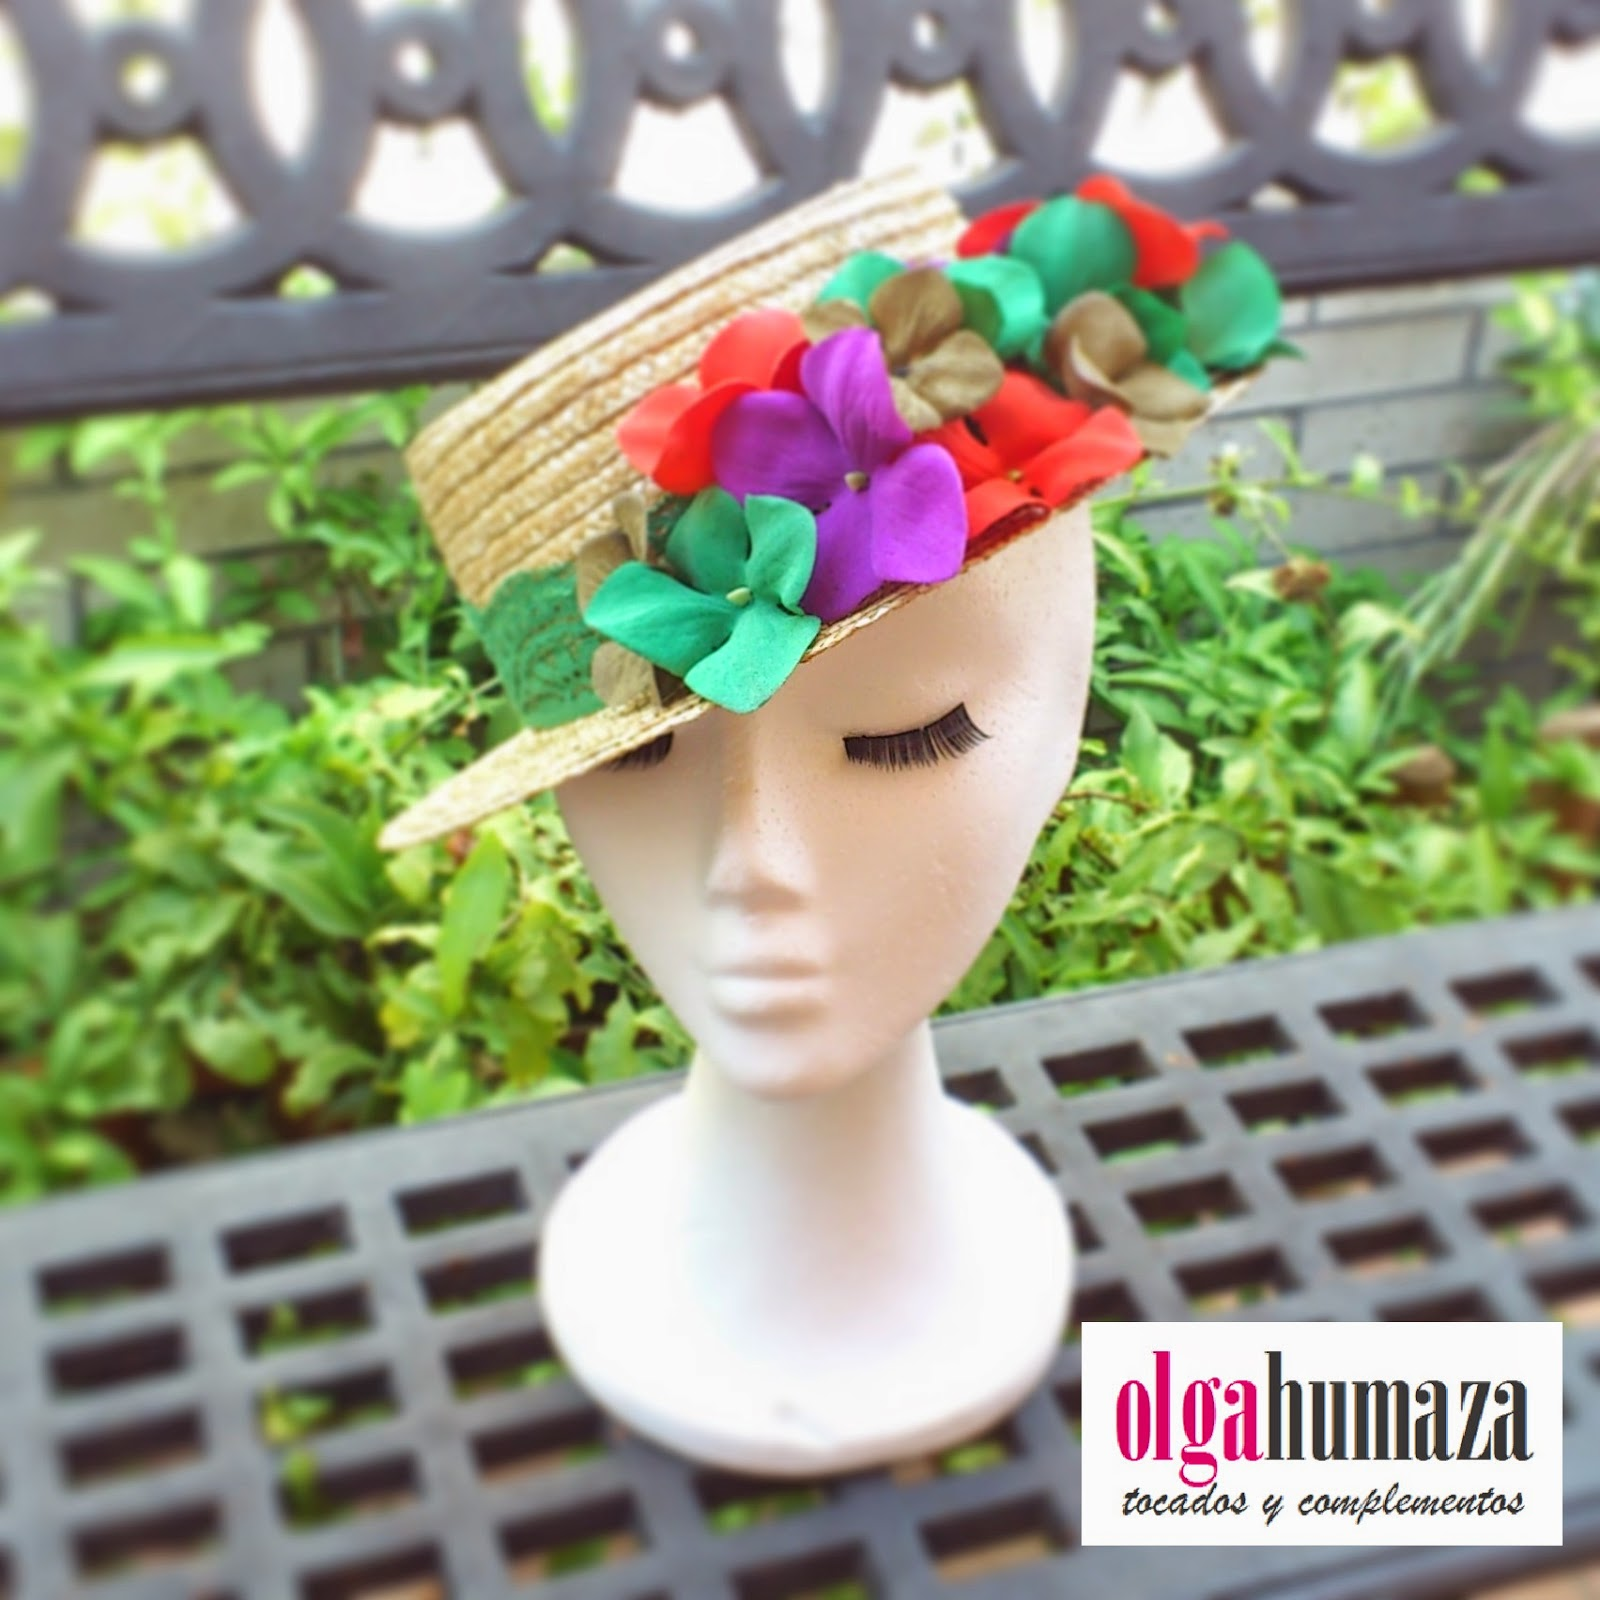 http://olgahumaza.blogspot.com.es/2014/06/b41-tocado-sombrero-canotier-flores.html